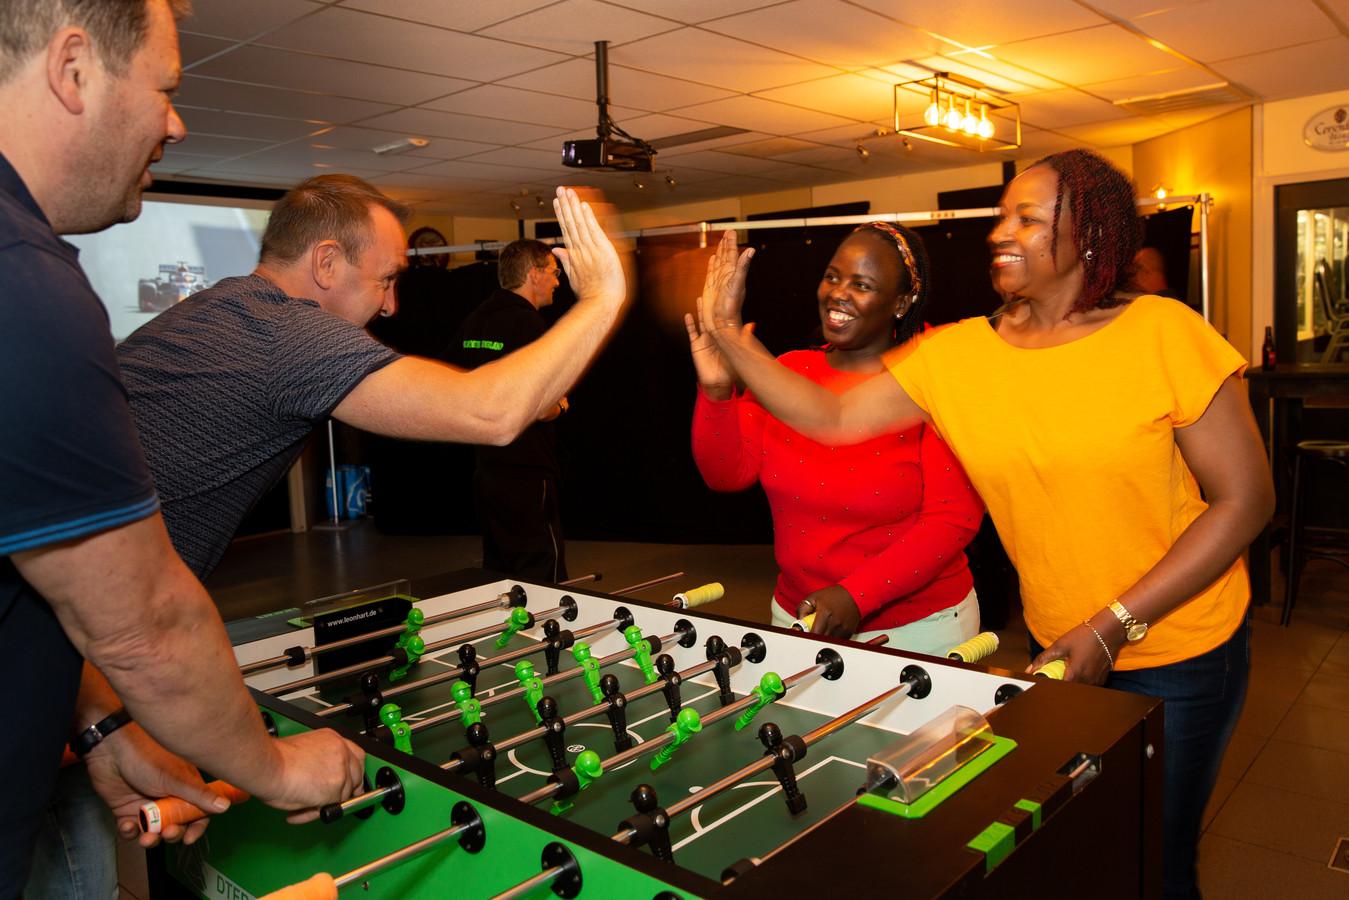 De dames Anna Namuddu (links) en Aisha Kulubyu spelen tegen Johnny Thys en Dennie Ballering.